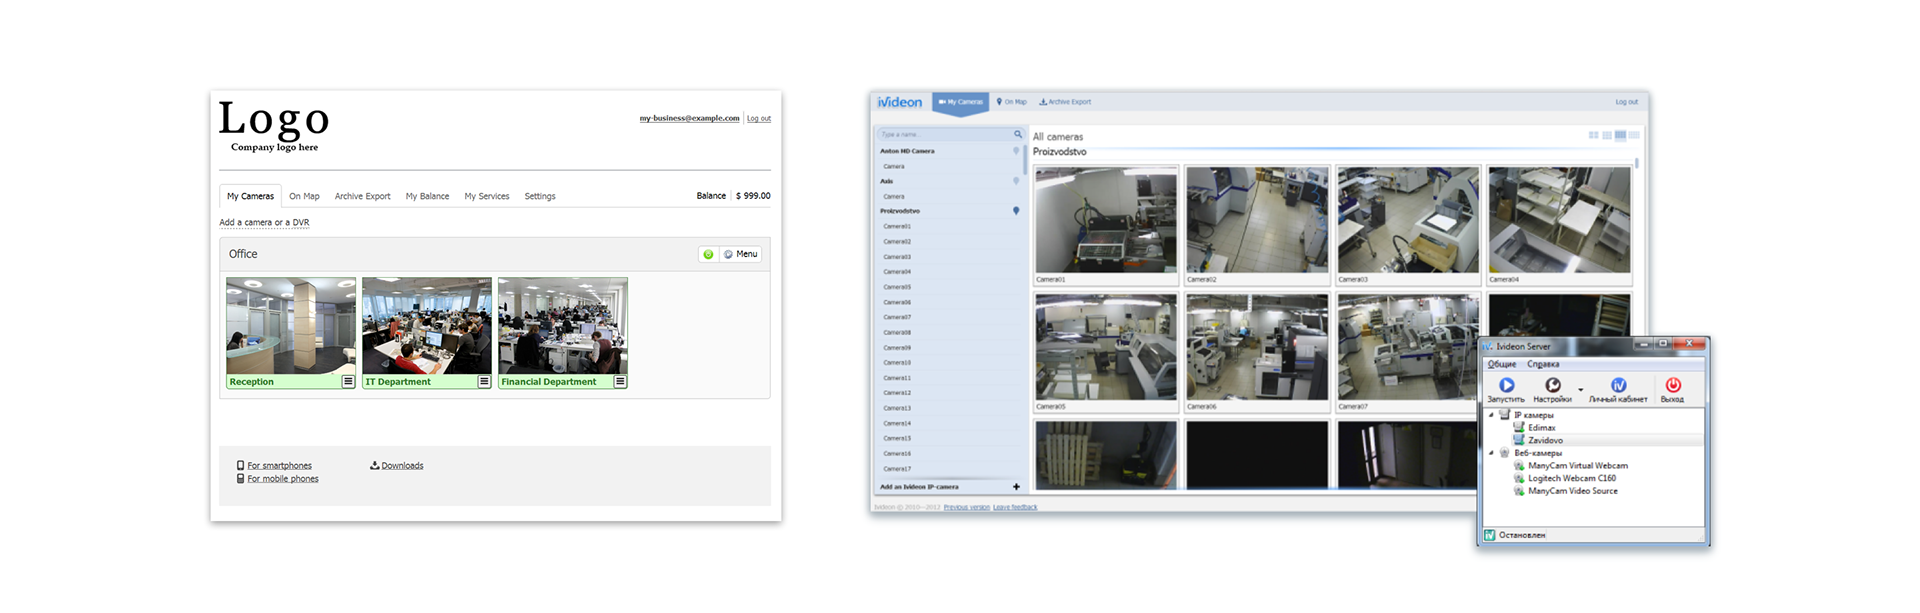 Maria Babak – Product Designer - Ivideon Video Monitoring Dashboard